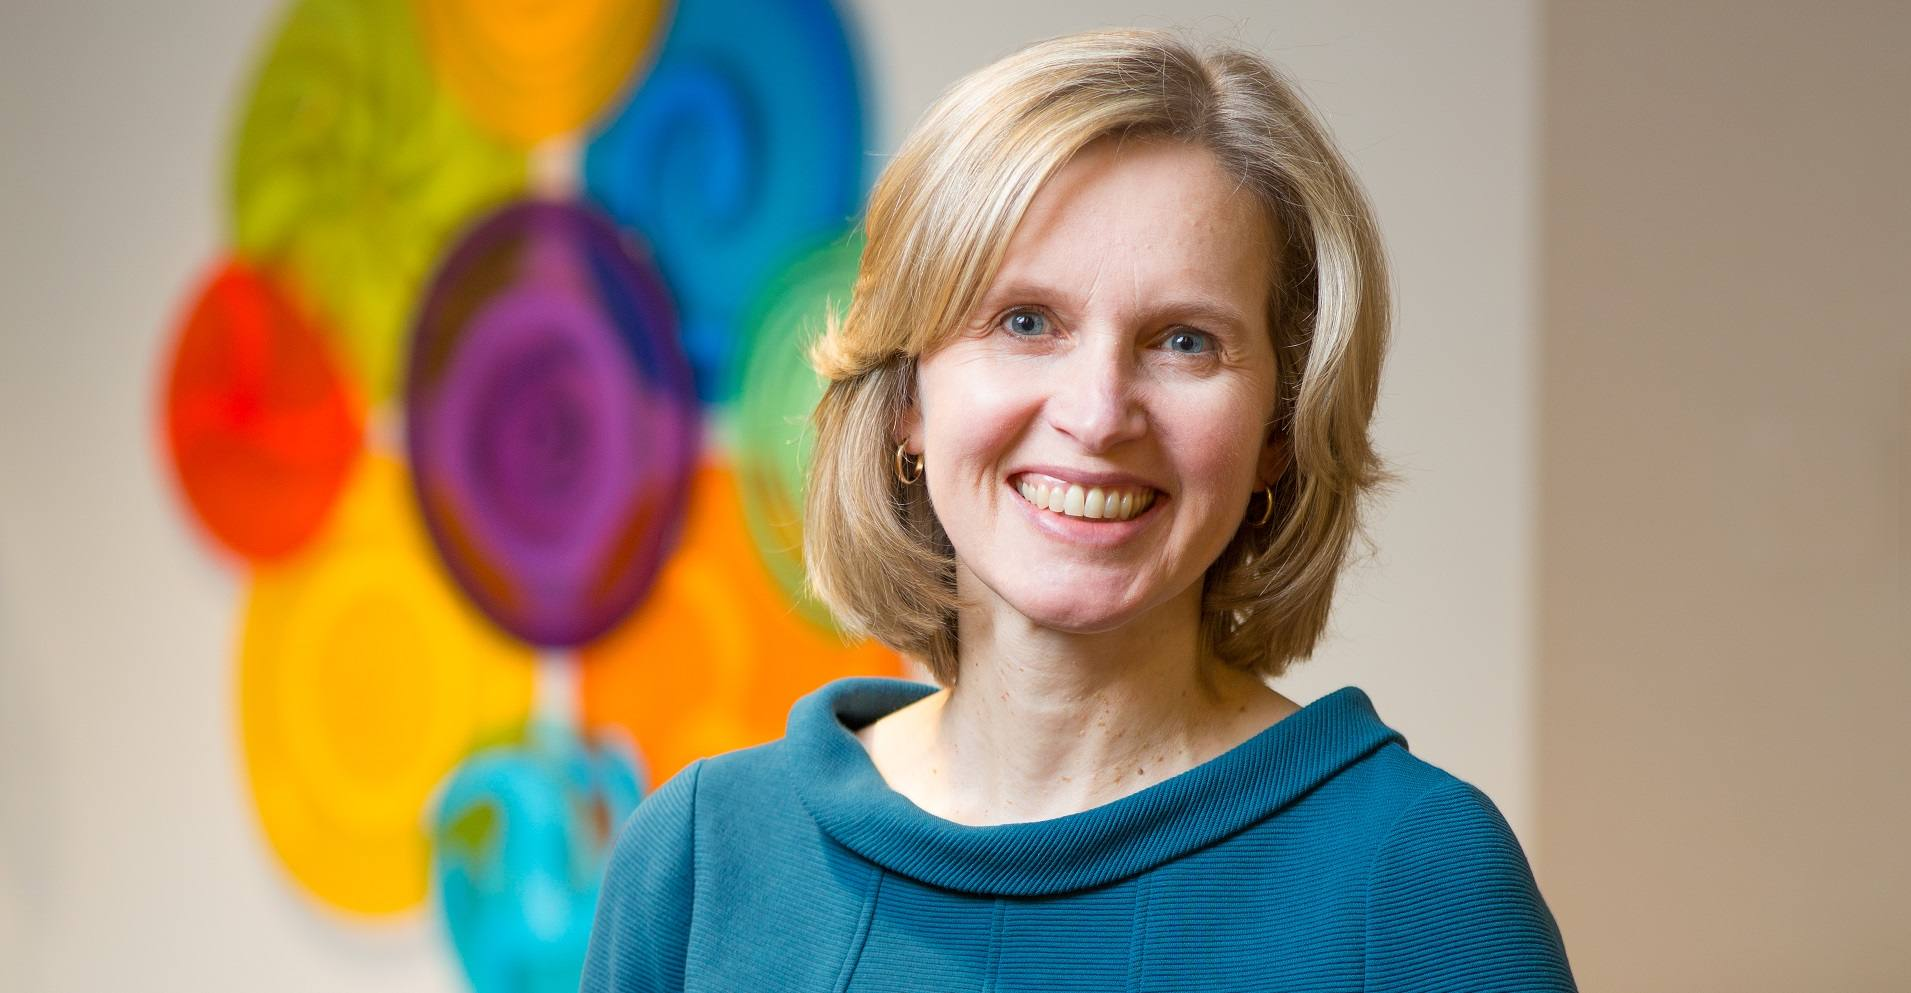 Meet Population Health Scholar--Kathy MacLaughlin, M.D.